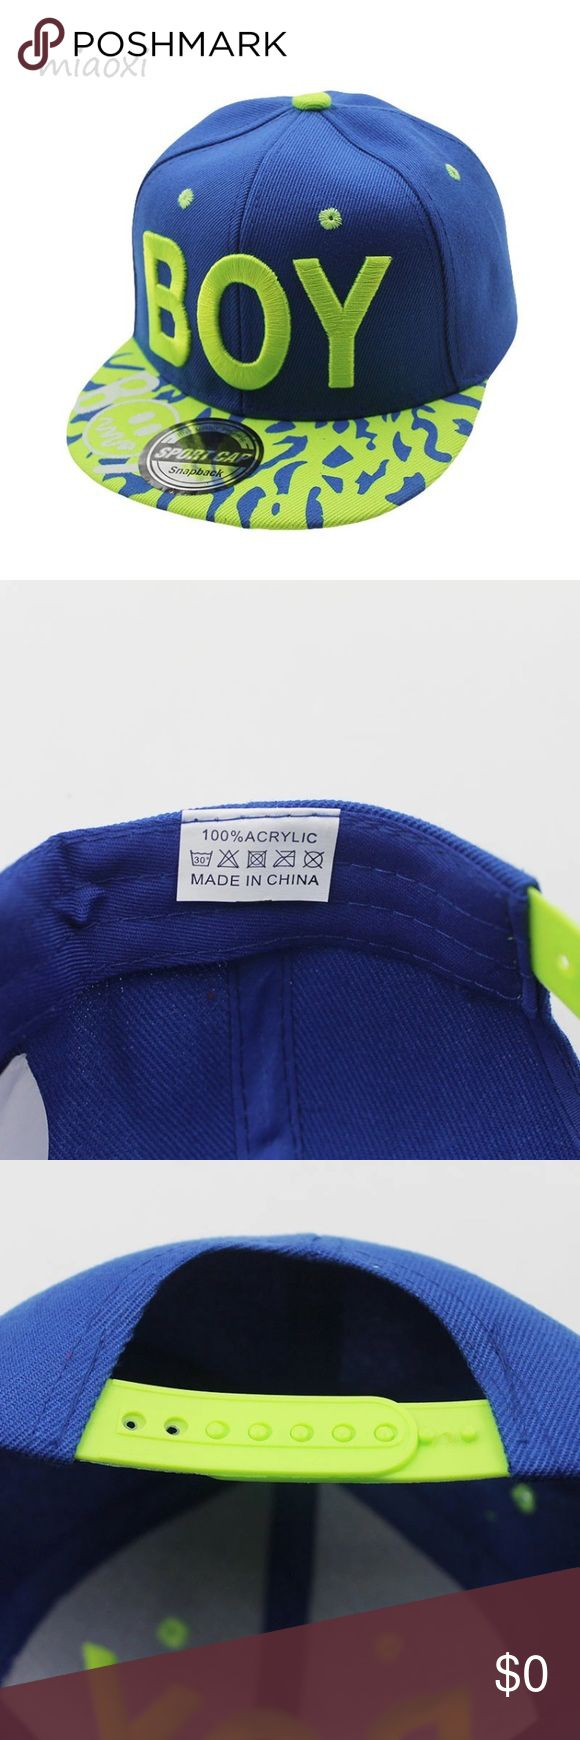 Coming Soon Boy'S Cap Coming soon Accessories Hats